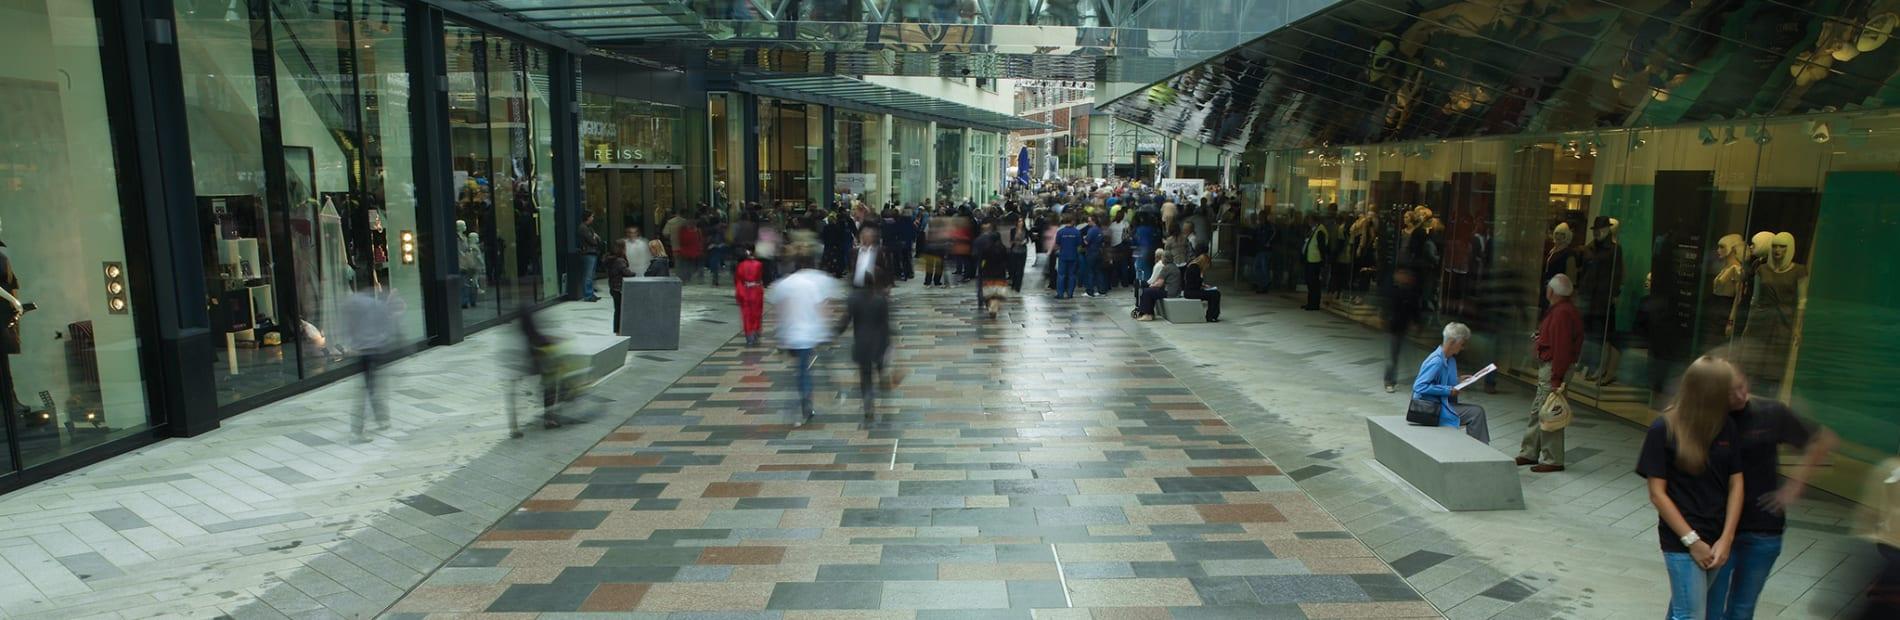 Granite paving in retail shopping centre.